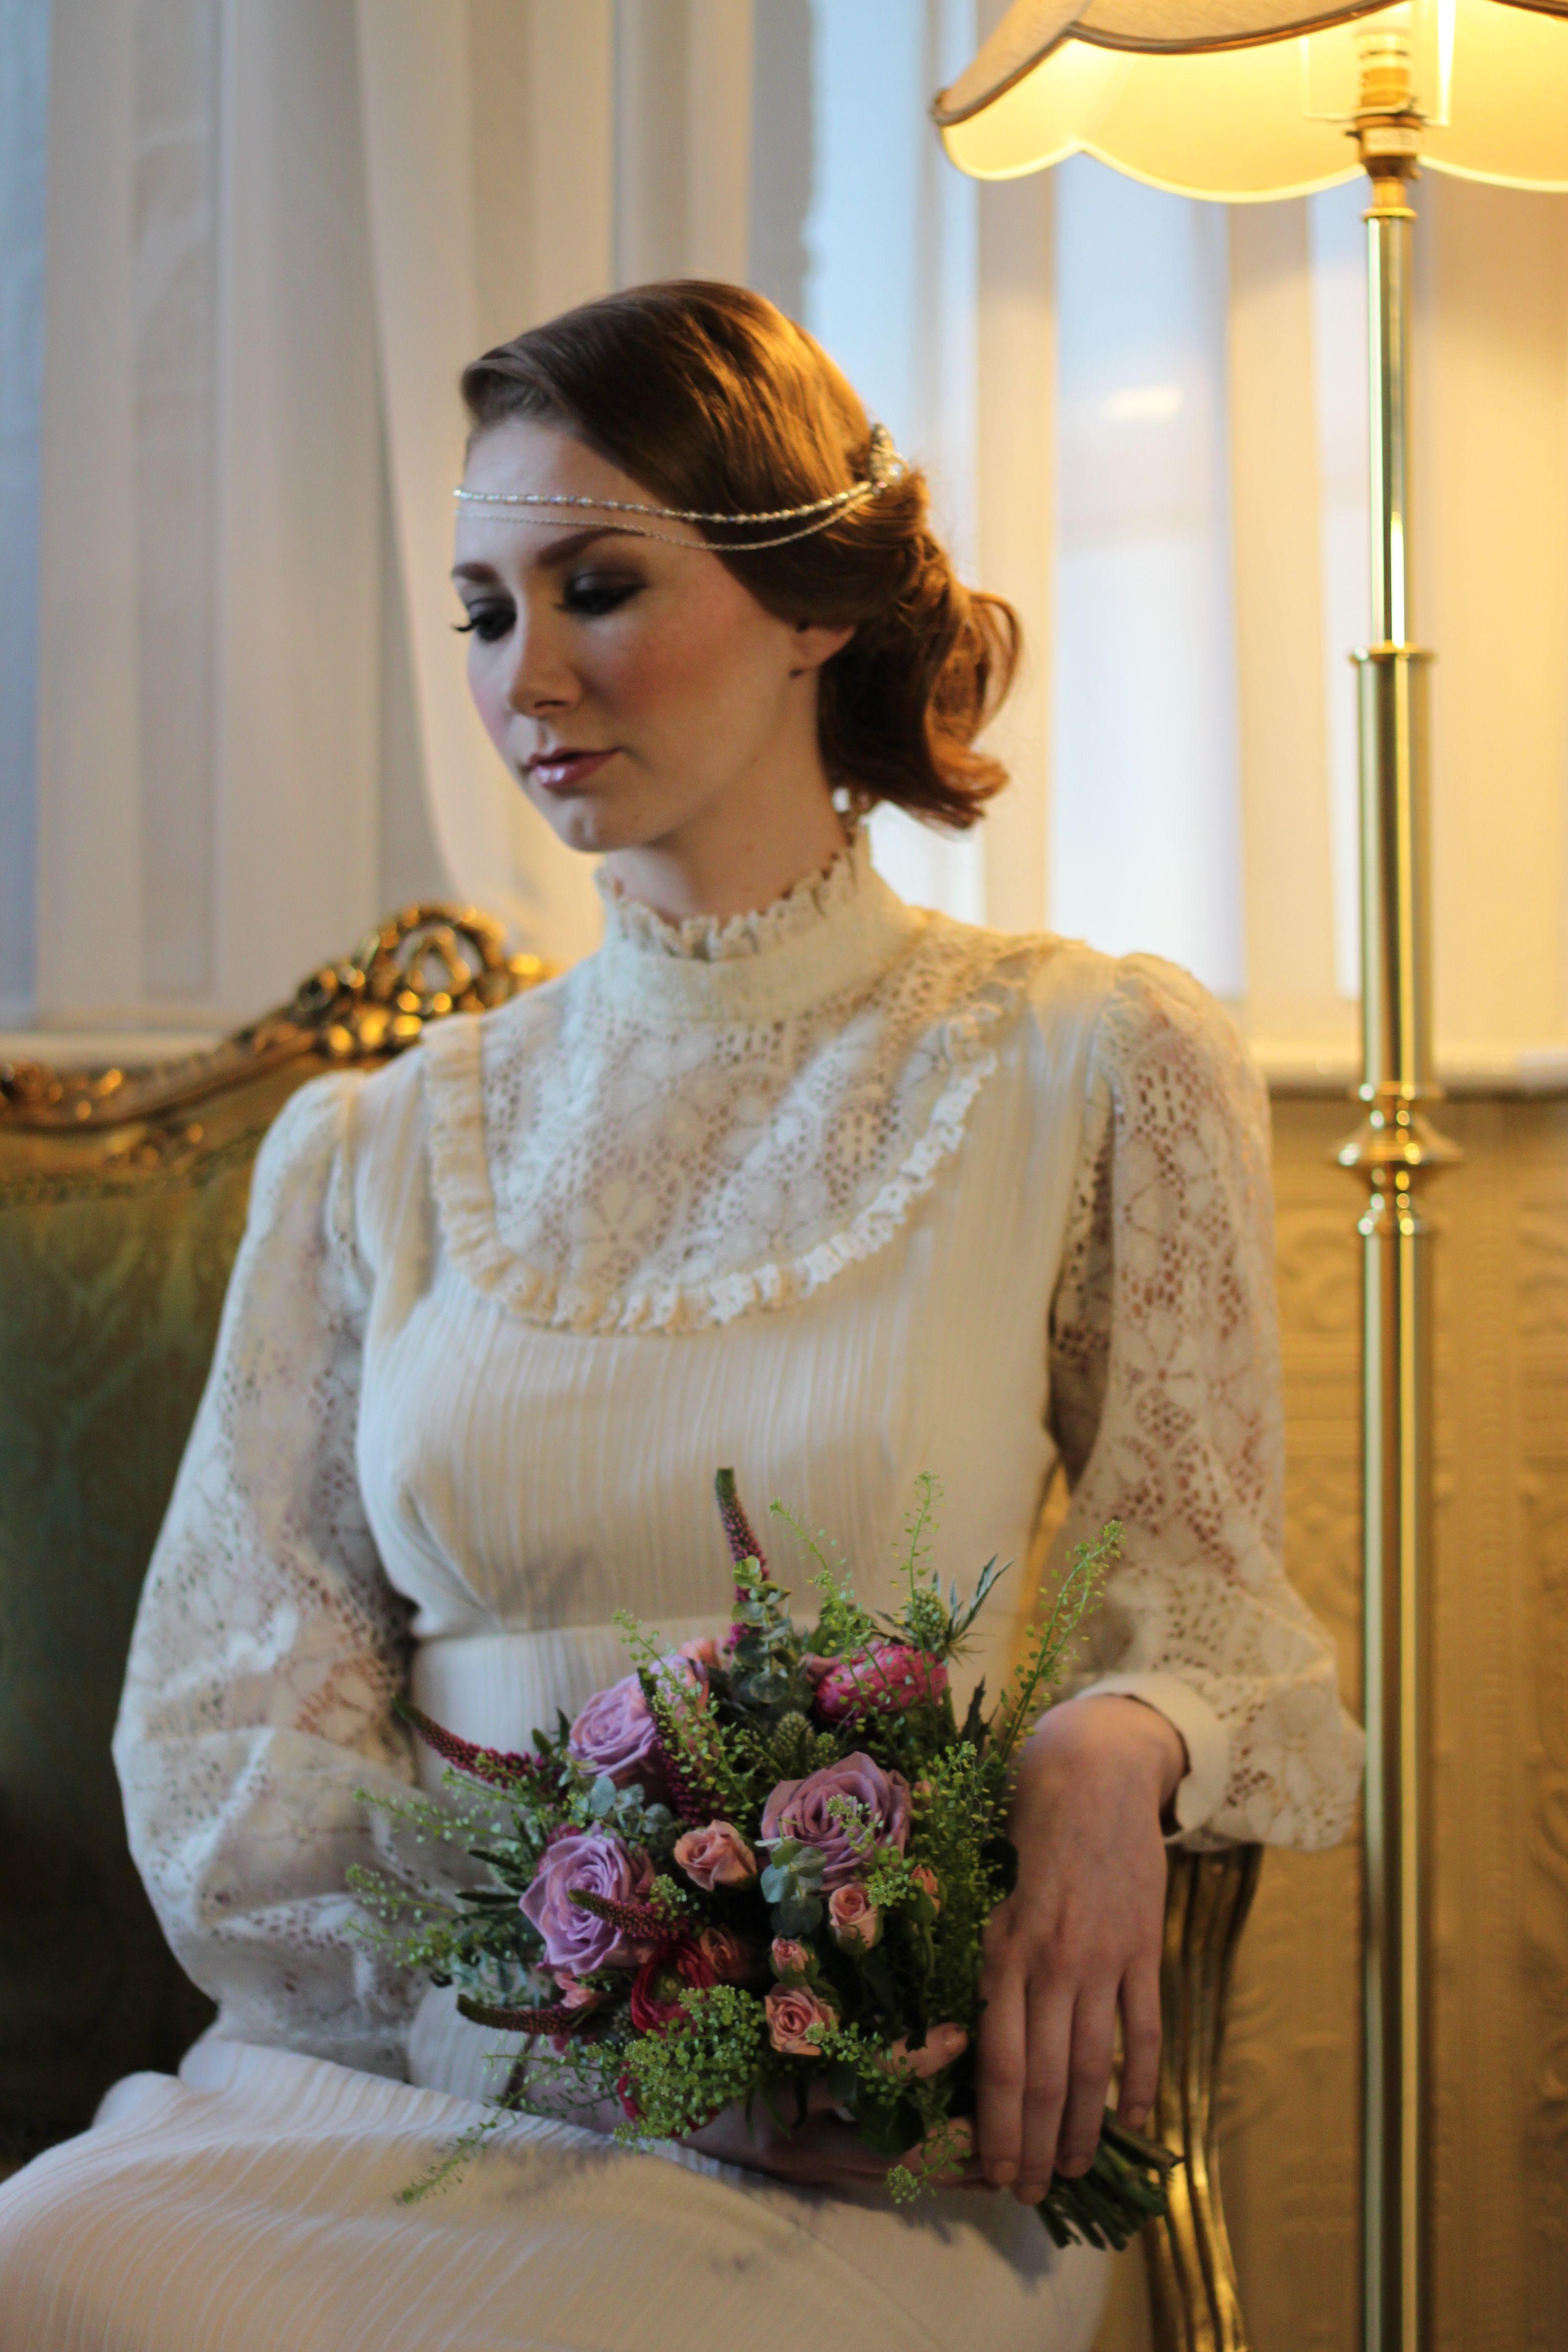 1970s edwardian style high neck lace vintage wedding dress